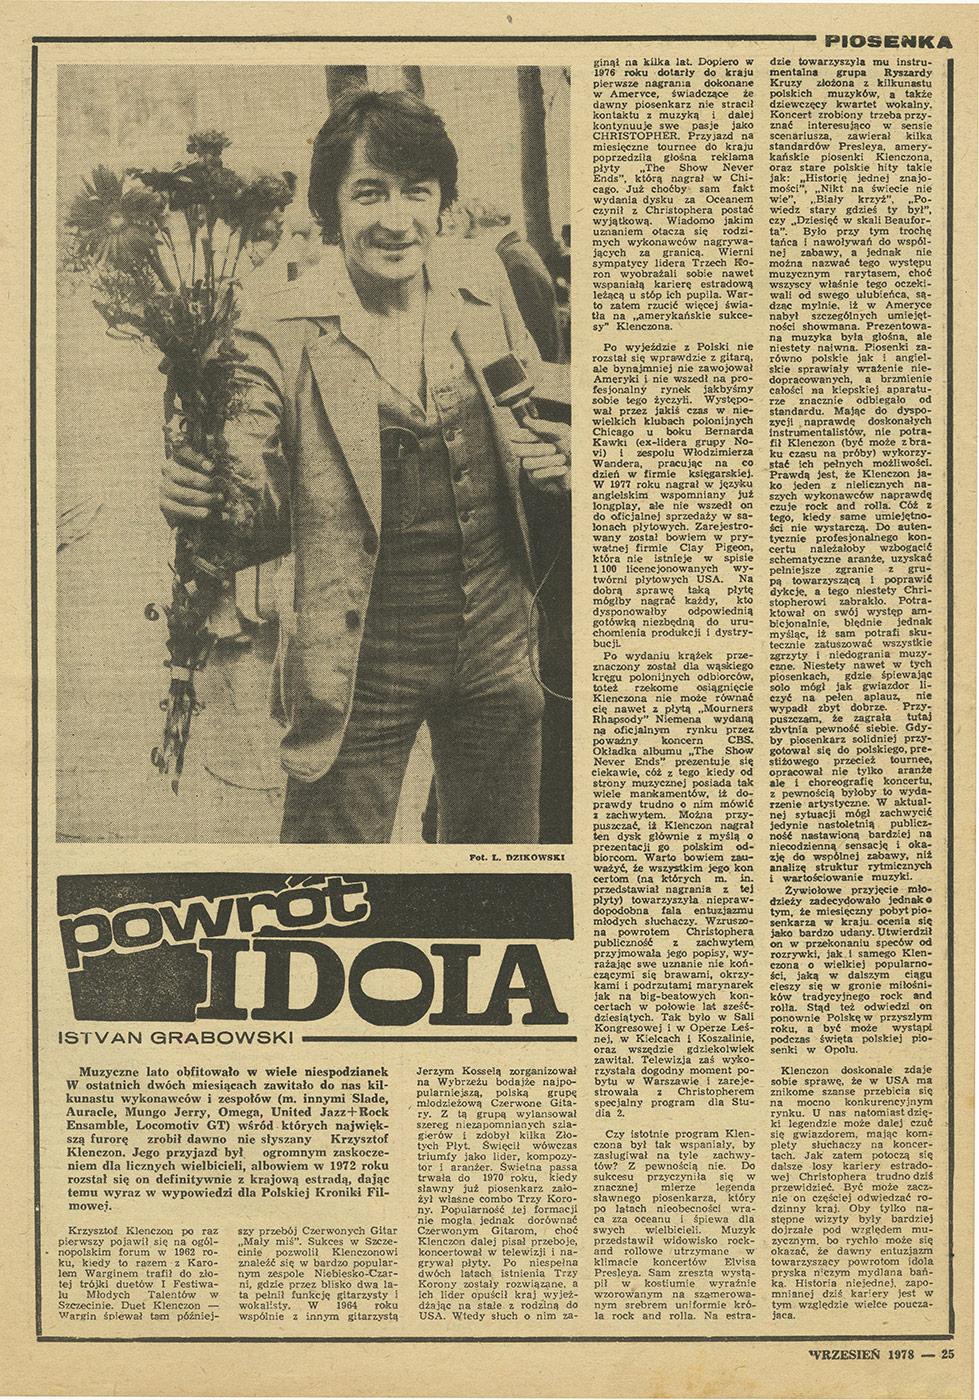 Przylot_KK_do_polski_na_koncert_prometej_1978016